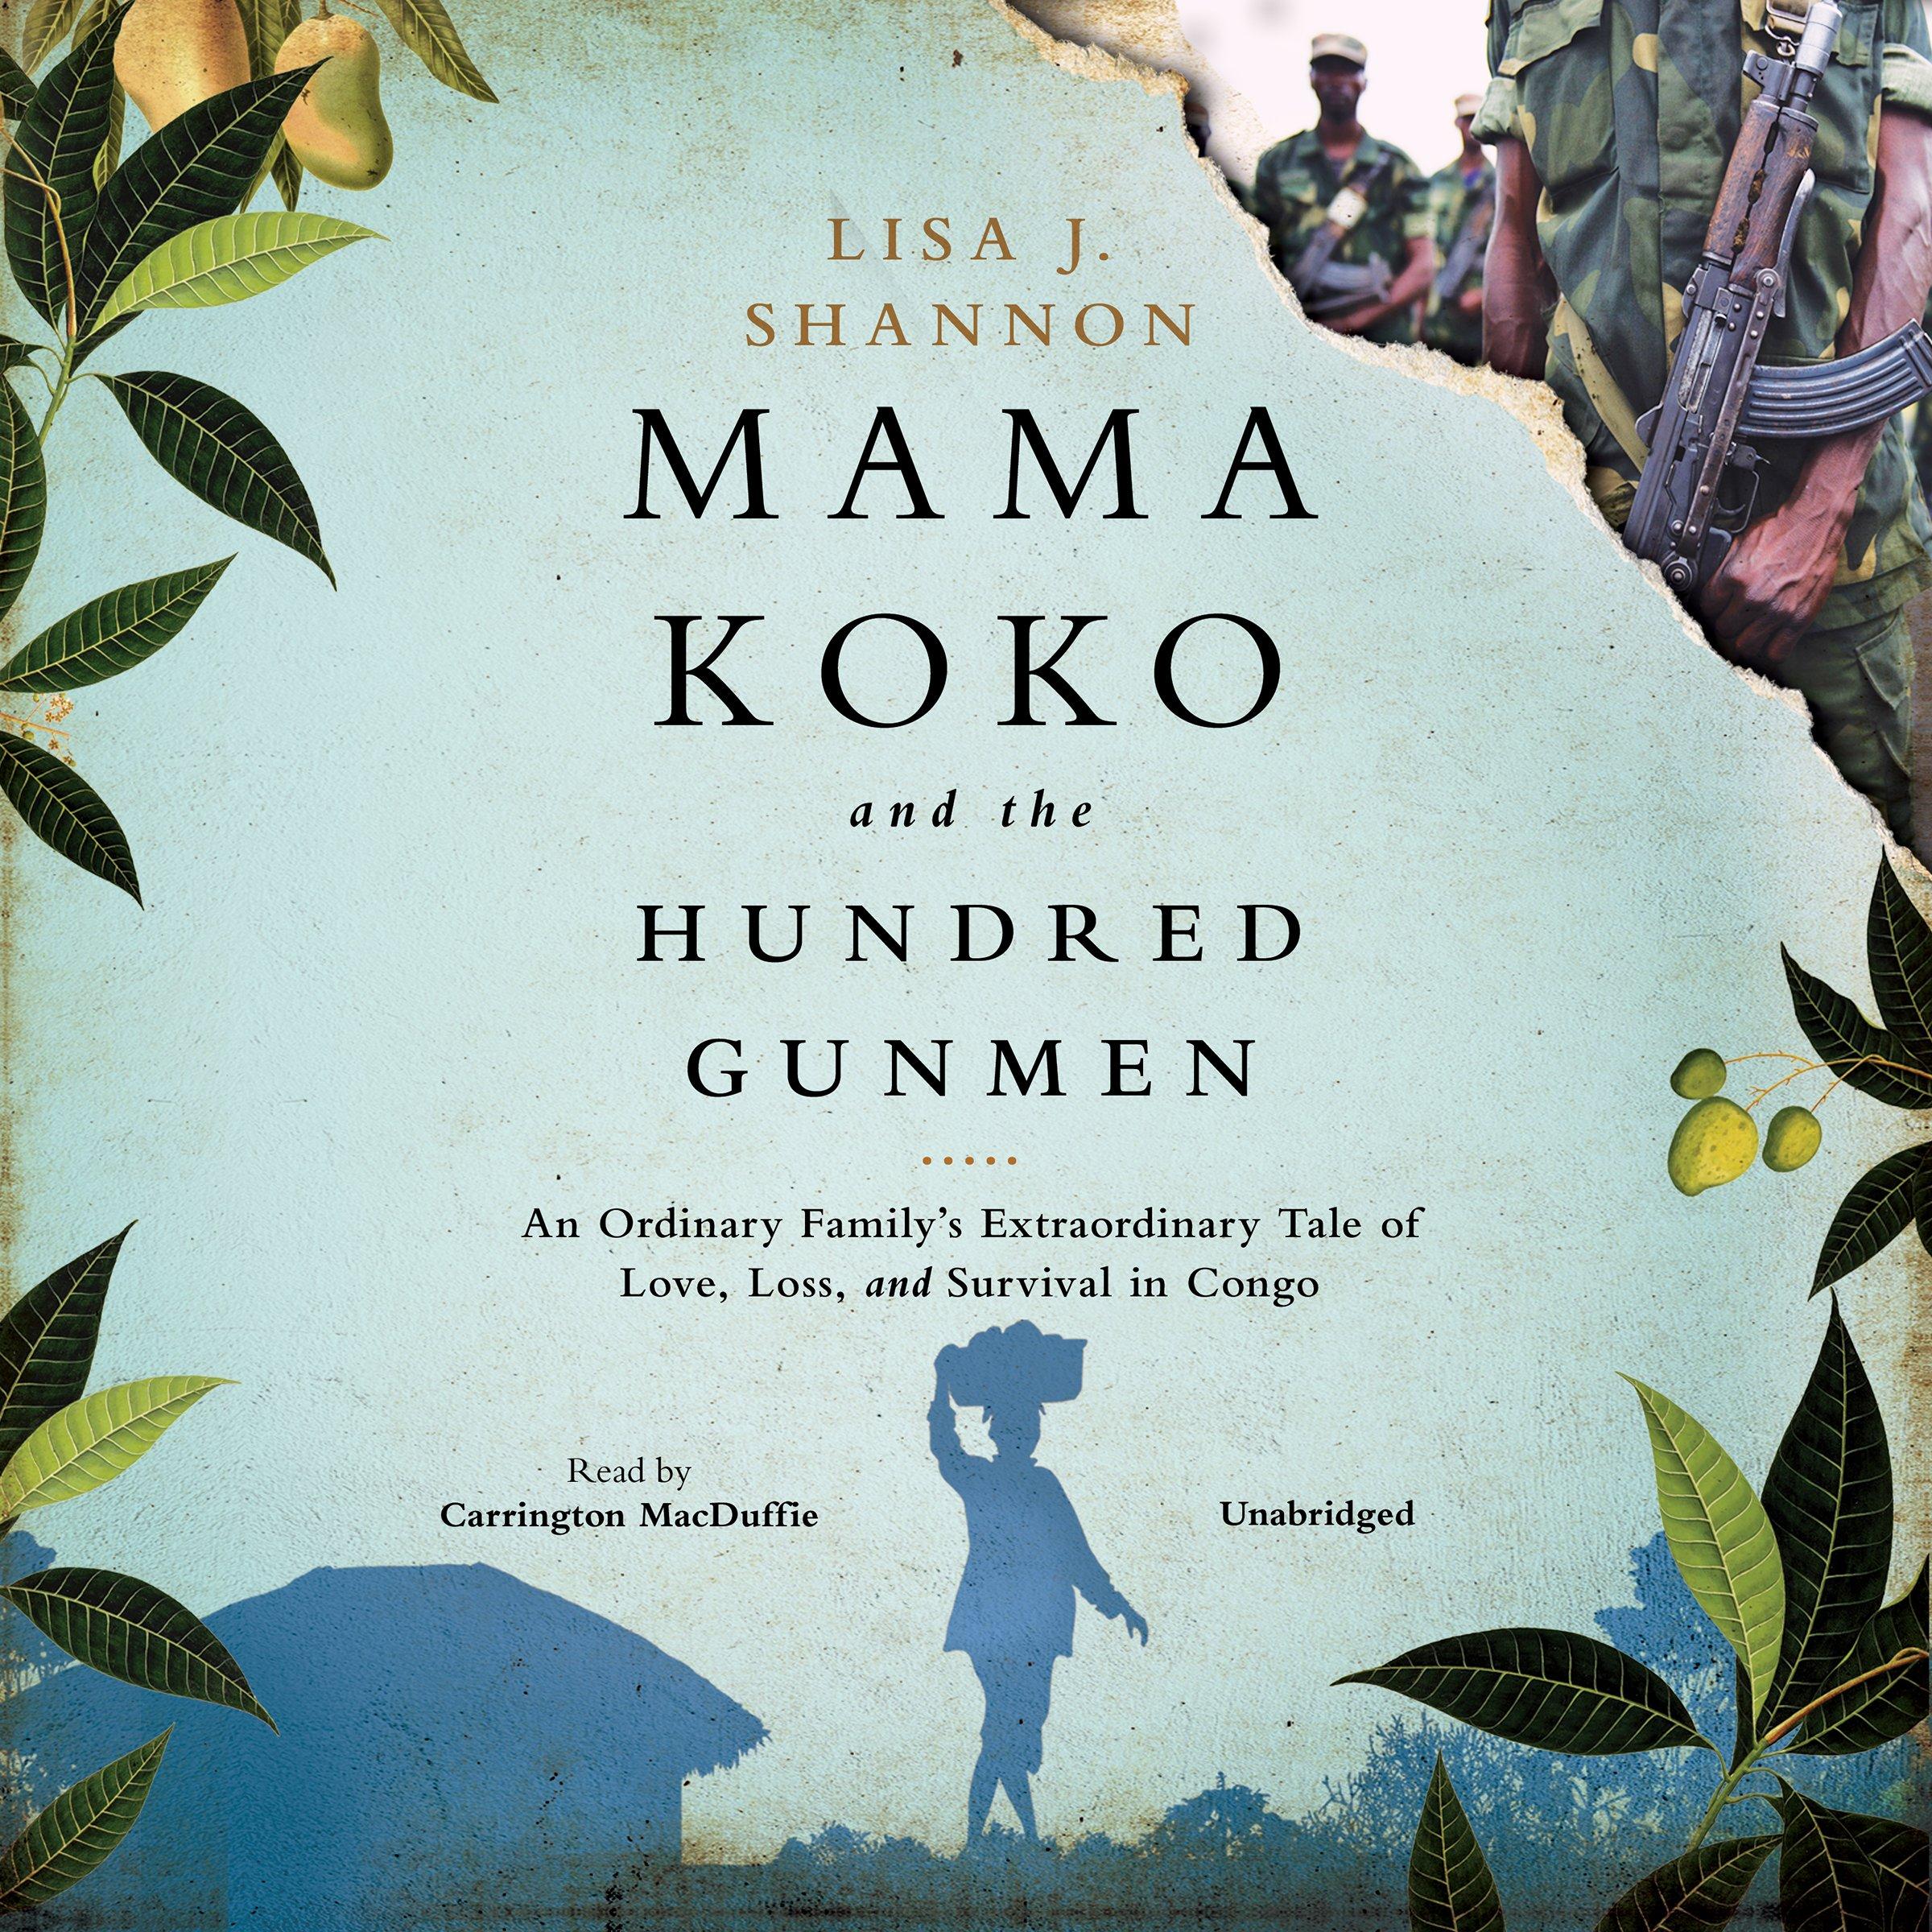 Mama Koko and the Hundred Gunmen: An Ordinary Family's Extraordinary Tale of Love, Loss, and Survival in Congo